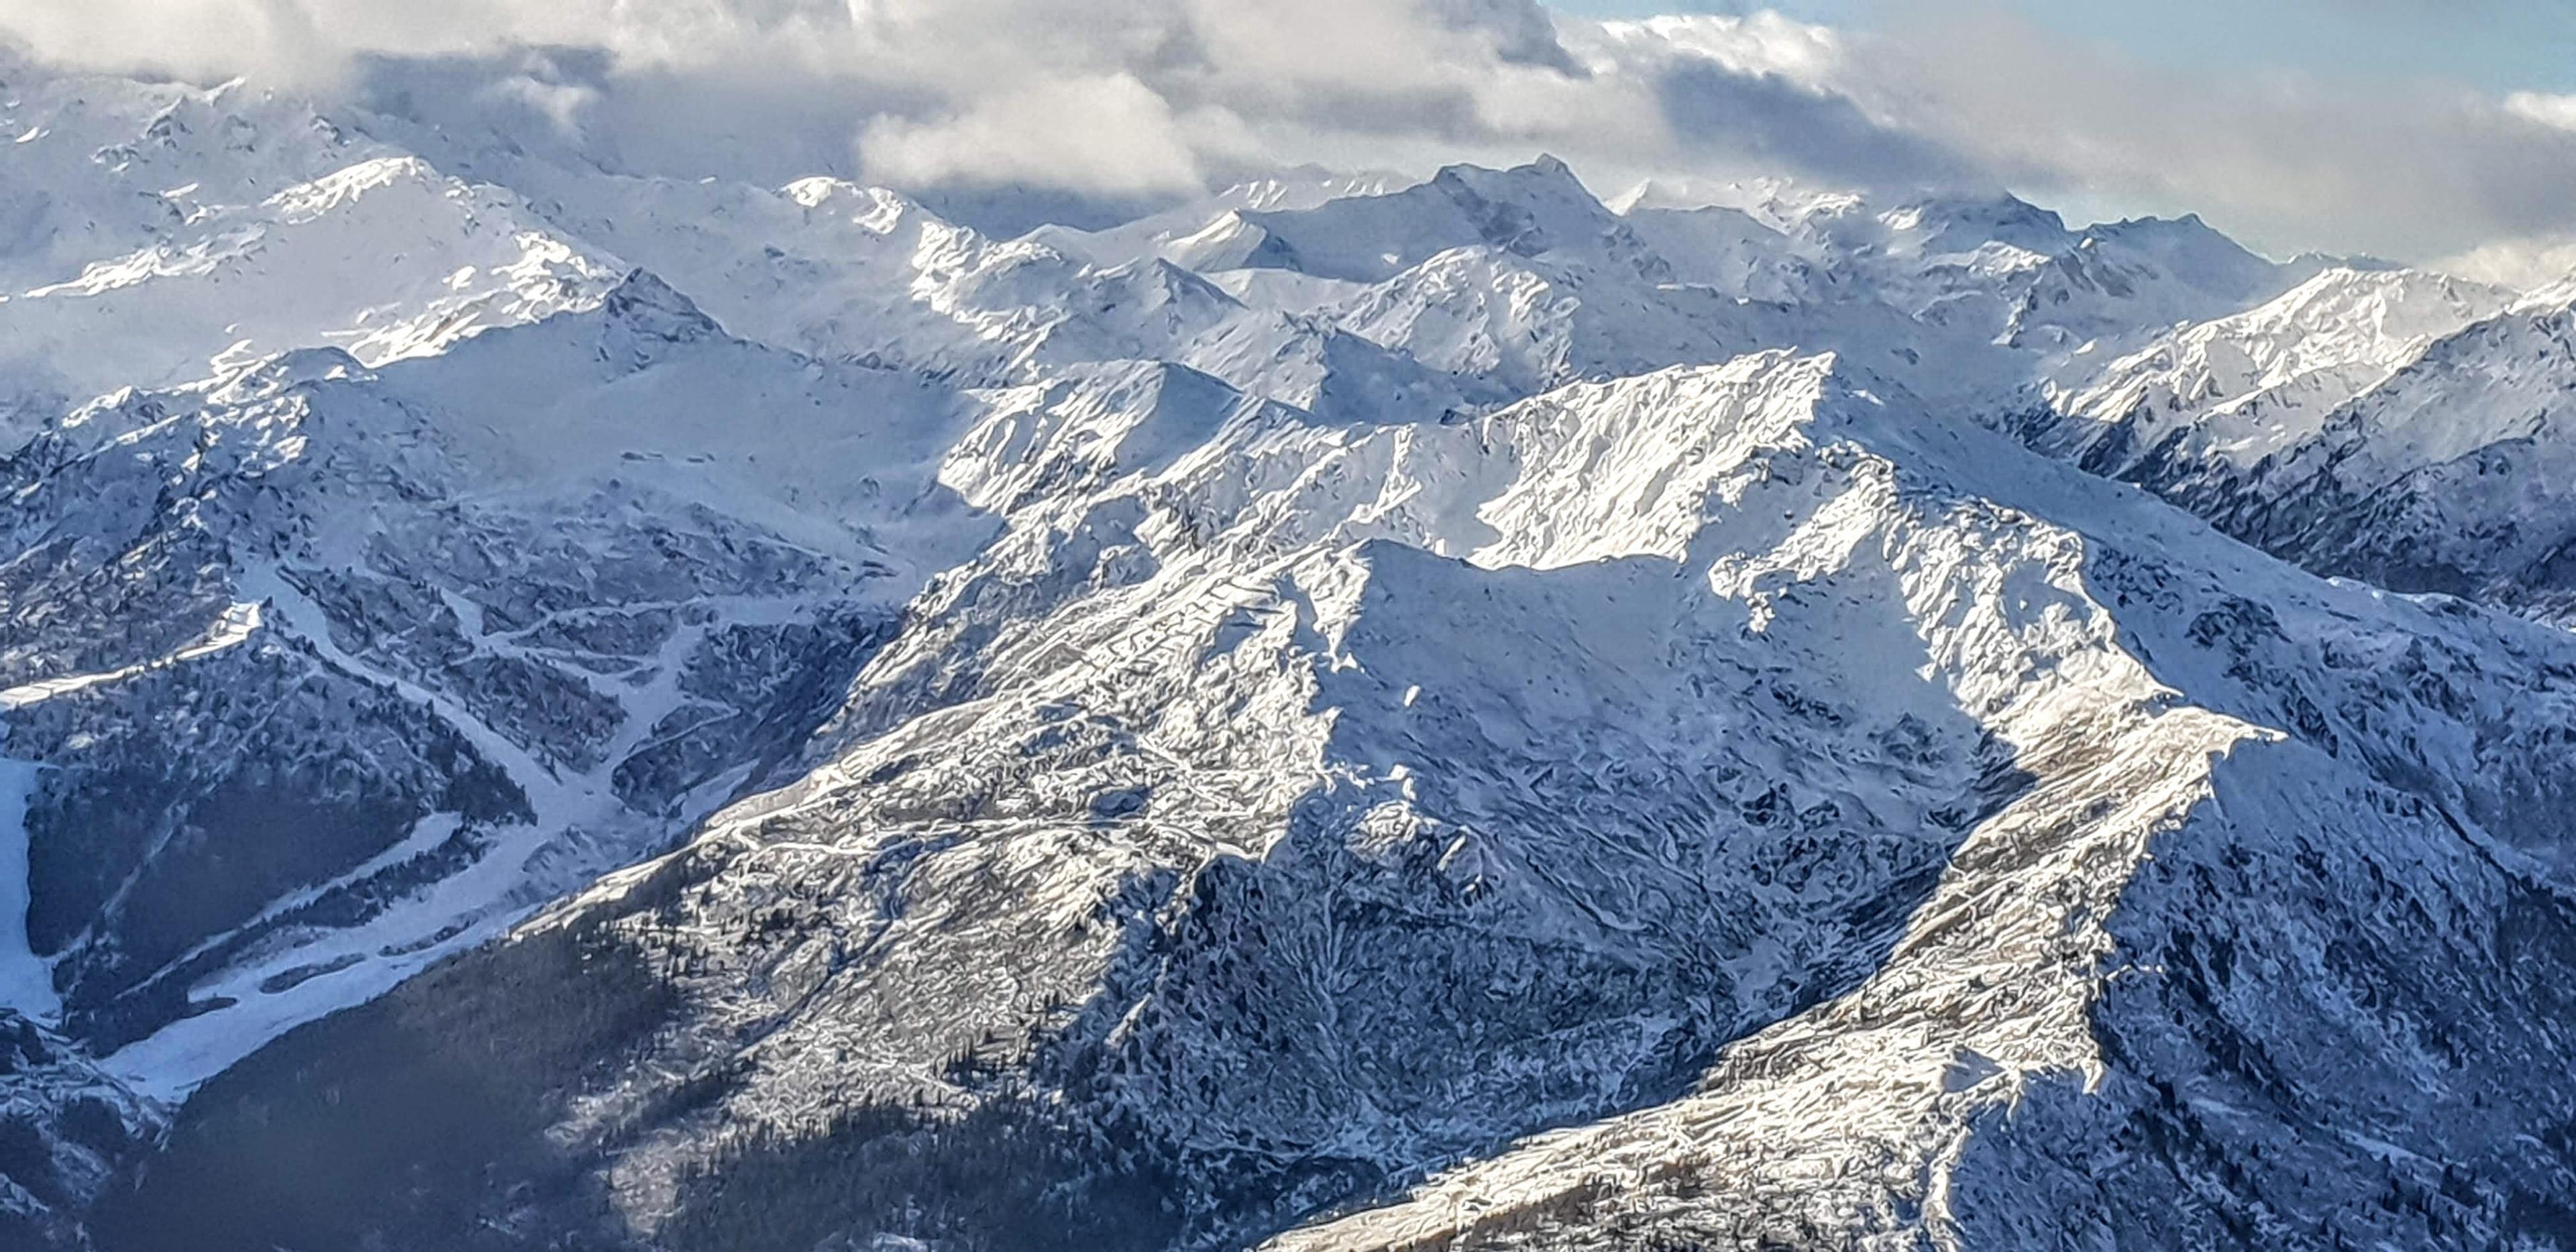 Fuegenberg, Tyrol, Austria